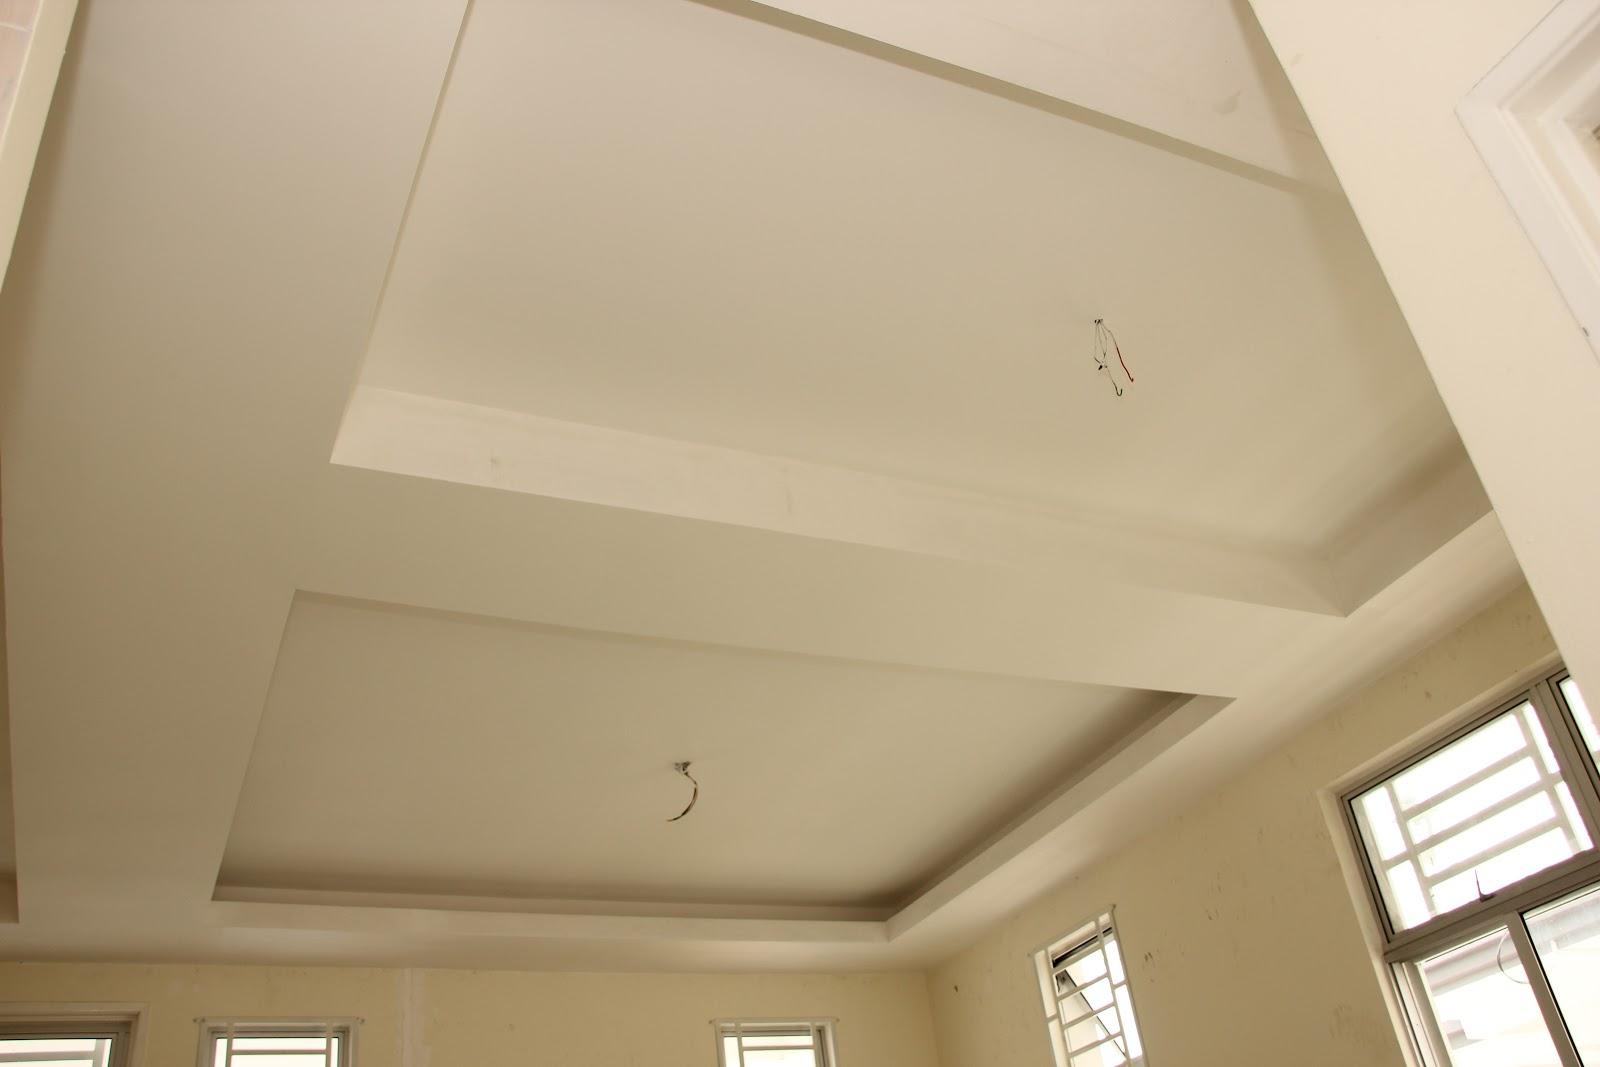 Plaster Ceiling Design : Plaster ceiling design bandar saujana putra